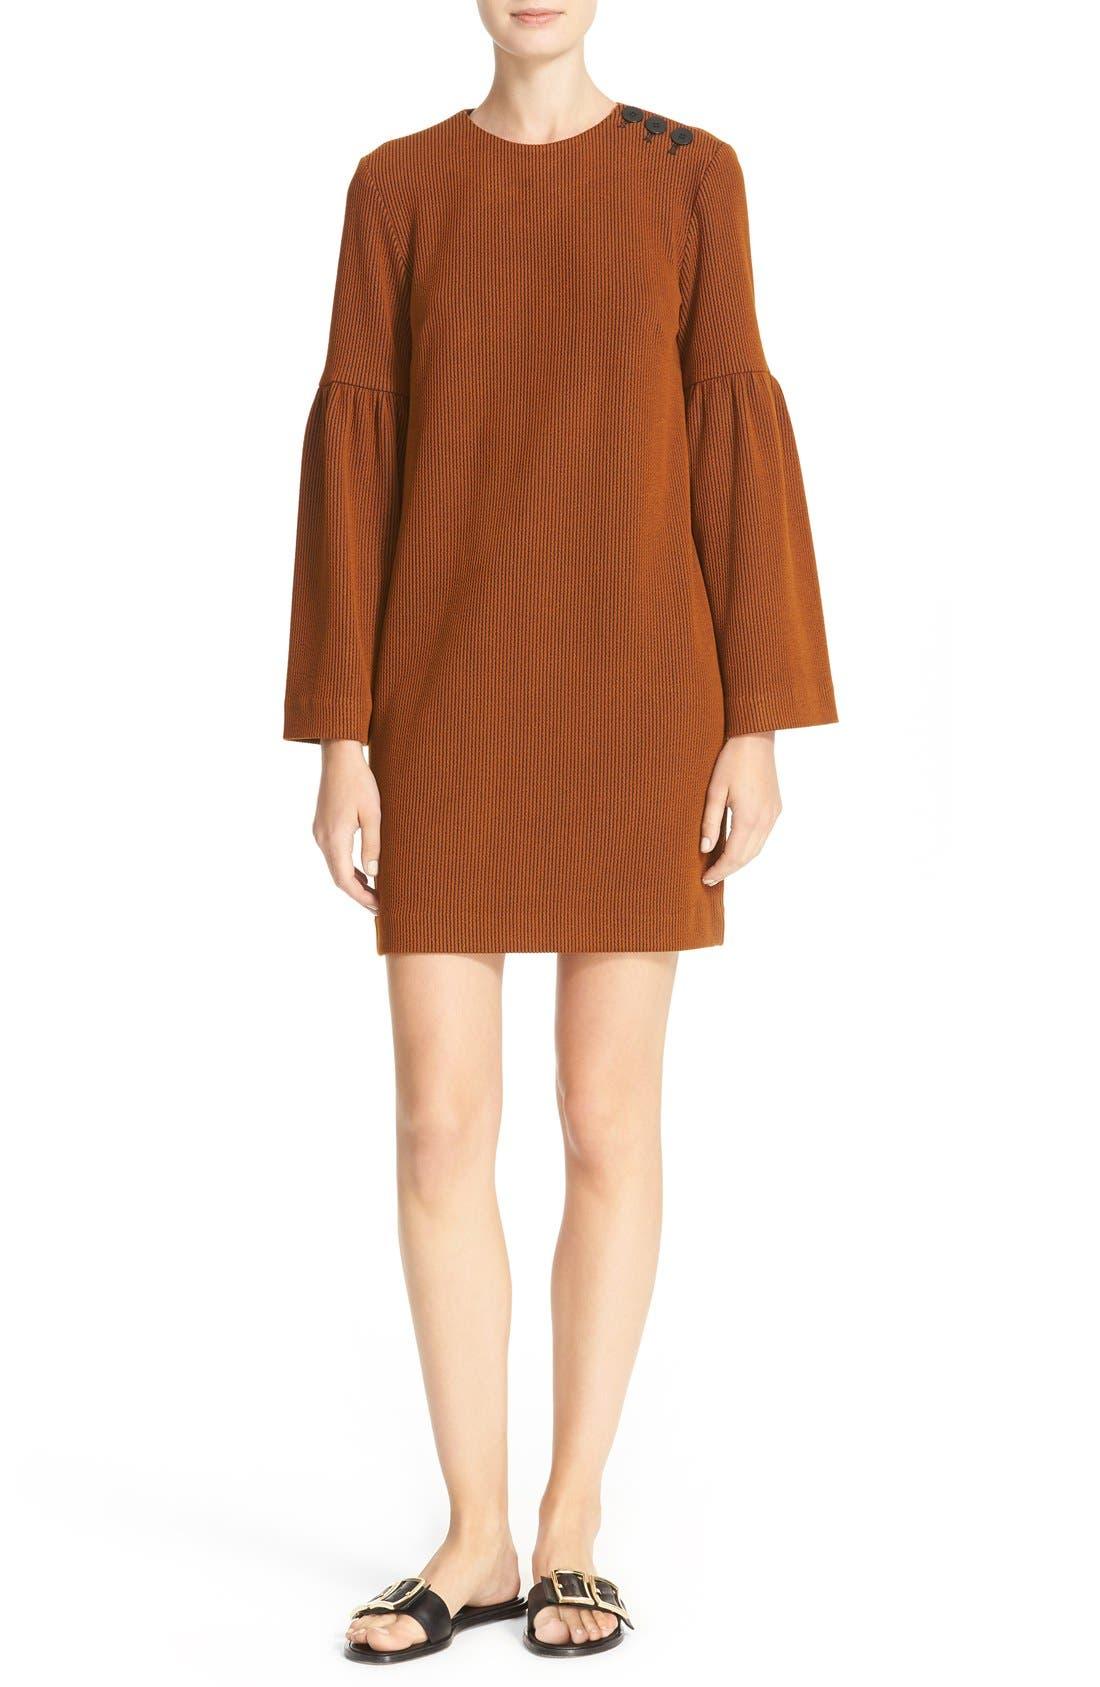 Main Image - Tibi Stripe Texture Knit Bell Sleeve Dress